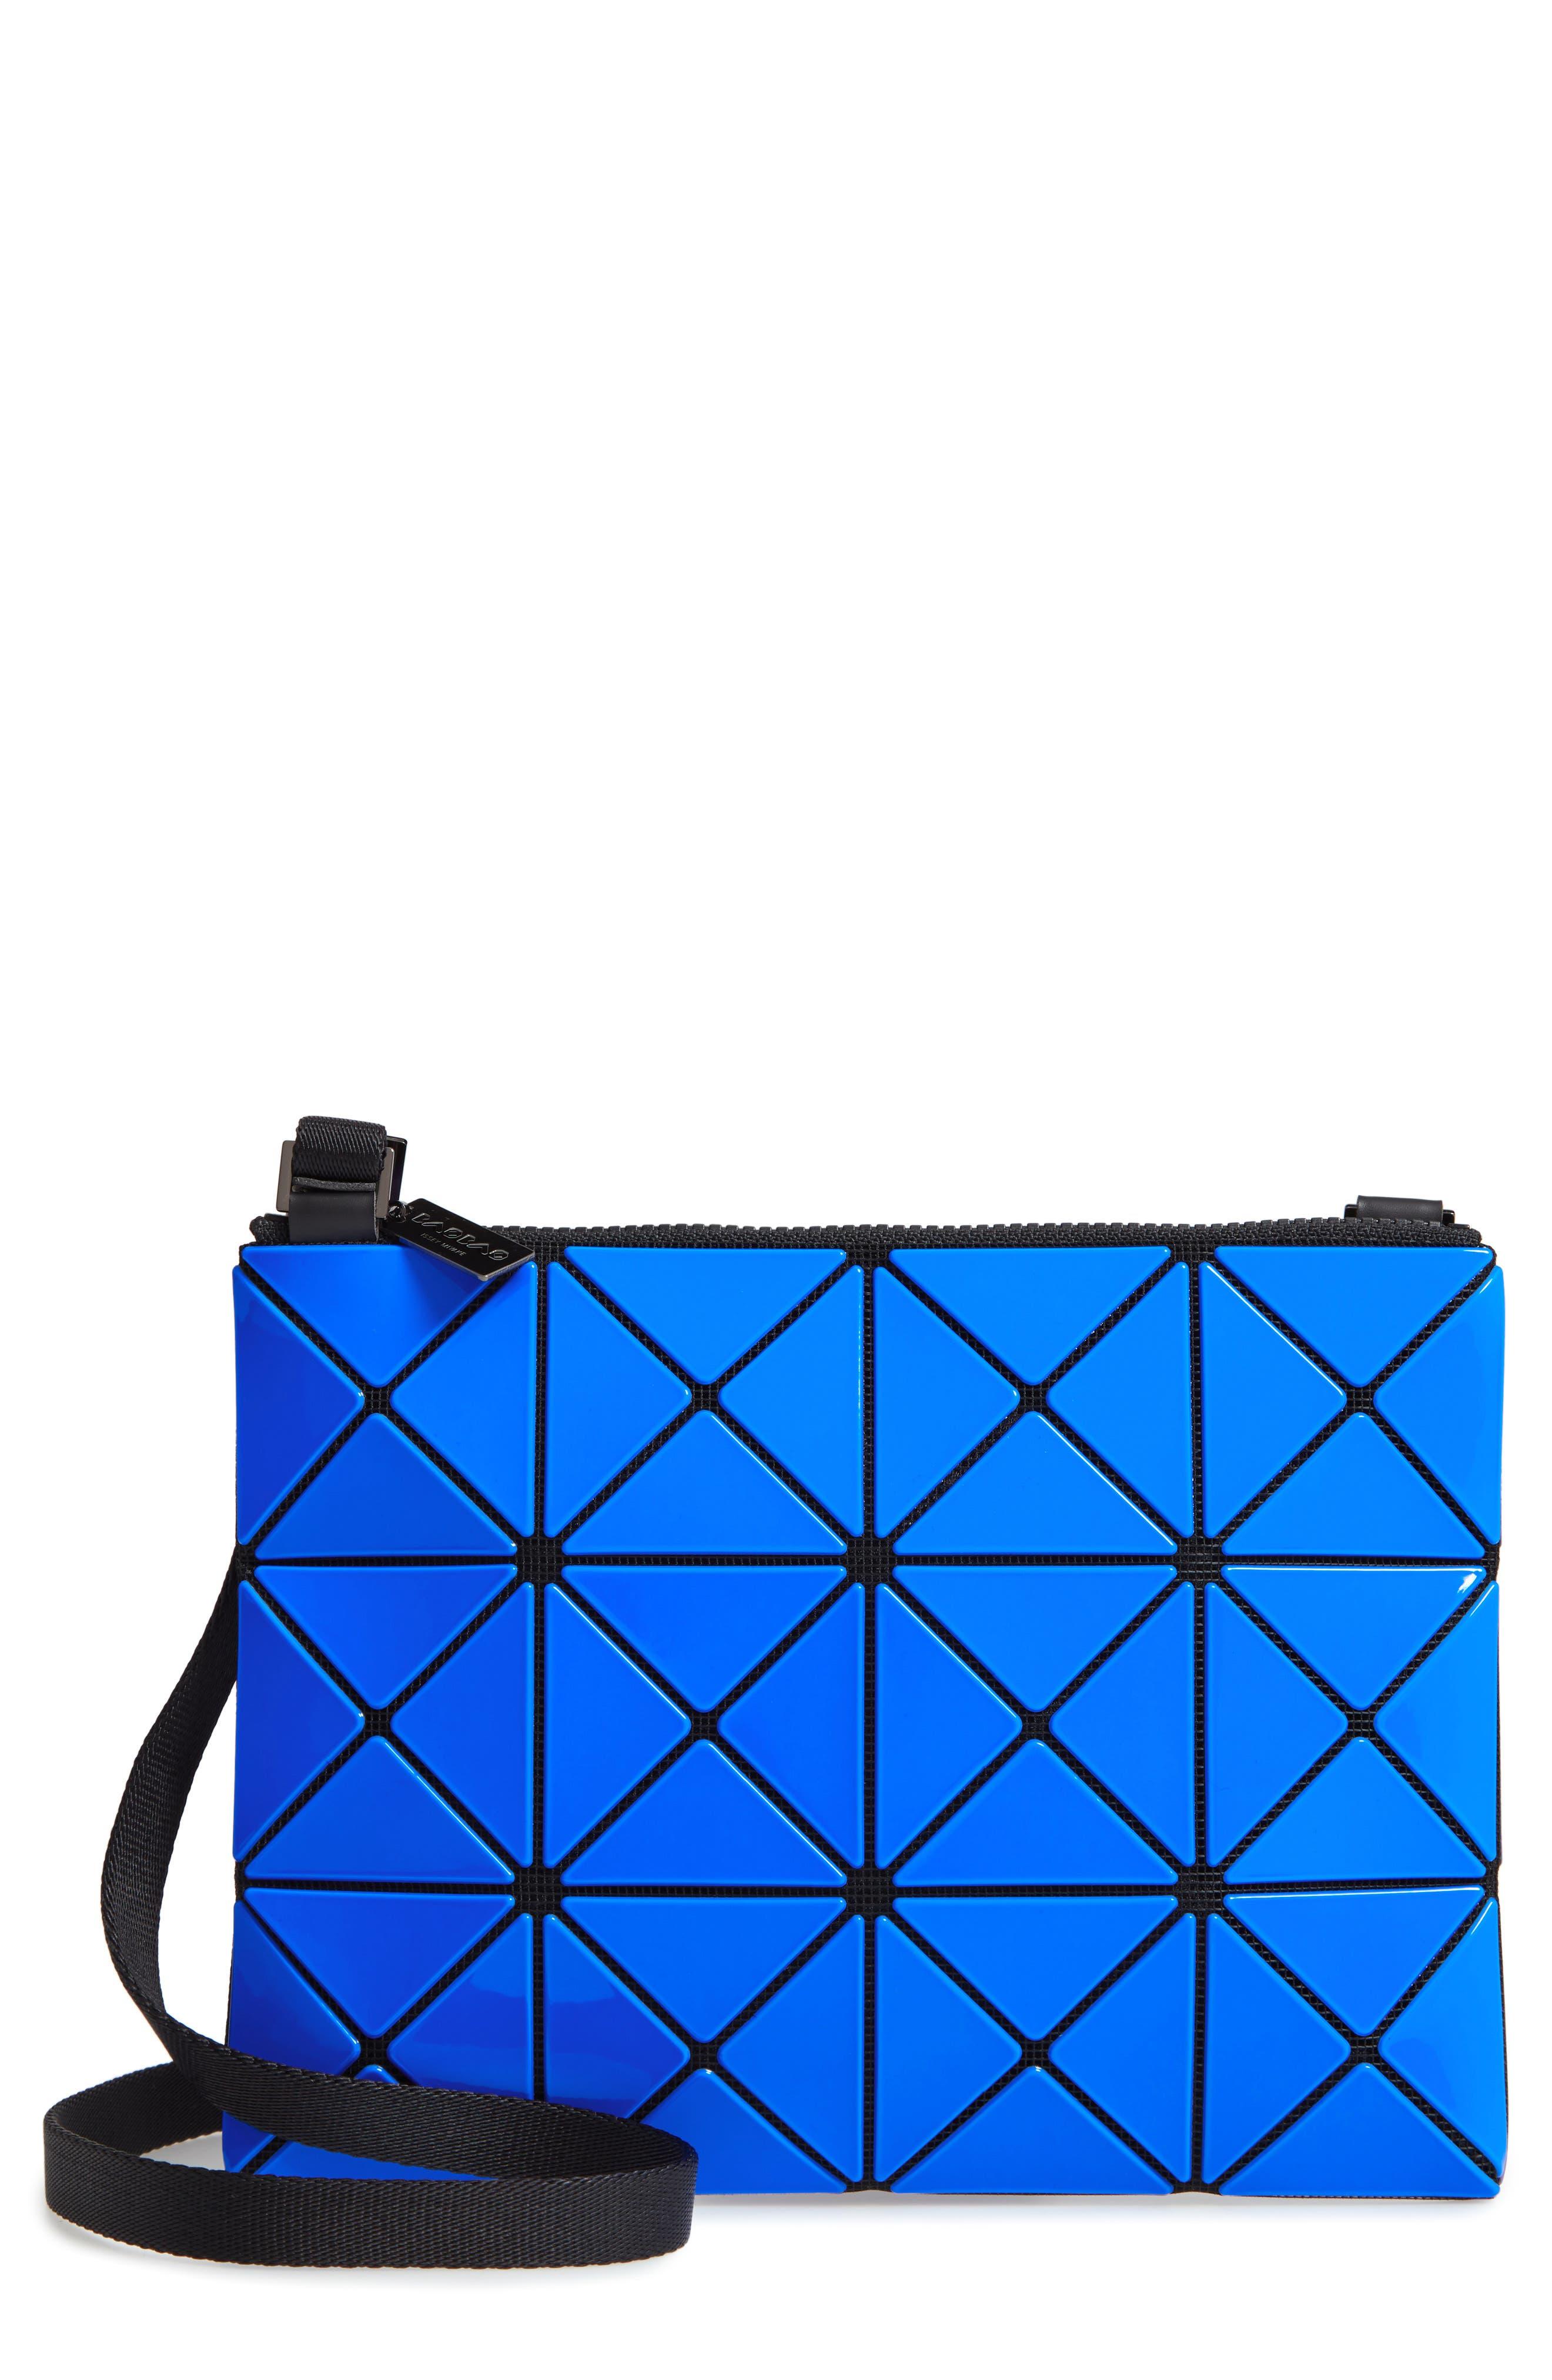 Lucent Two-Tone Crossbody Bag,                             Main thumbnail 1, color,                             400